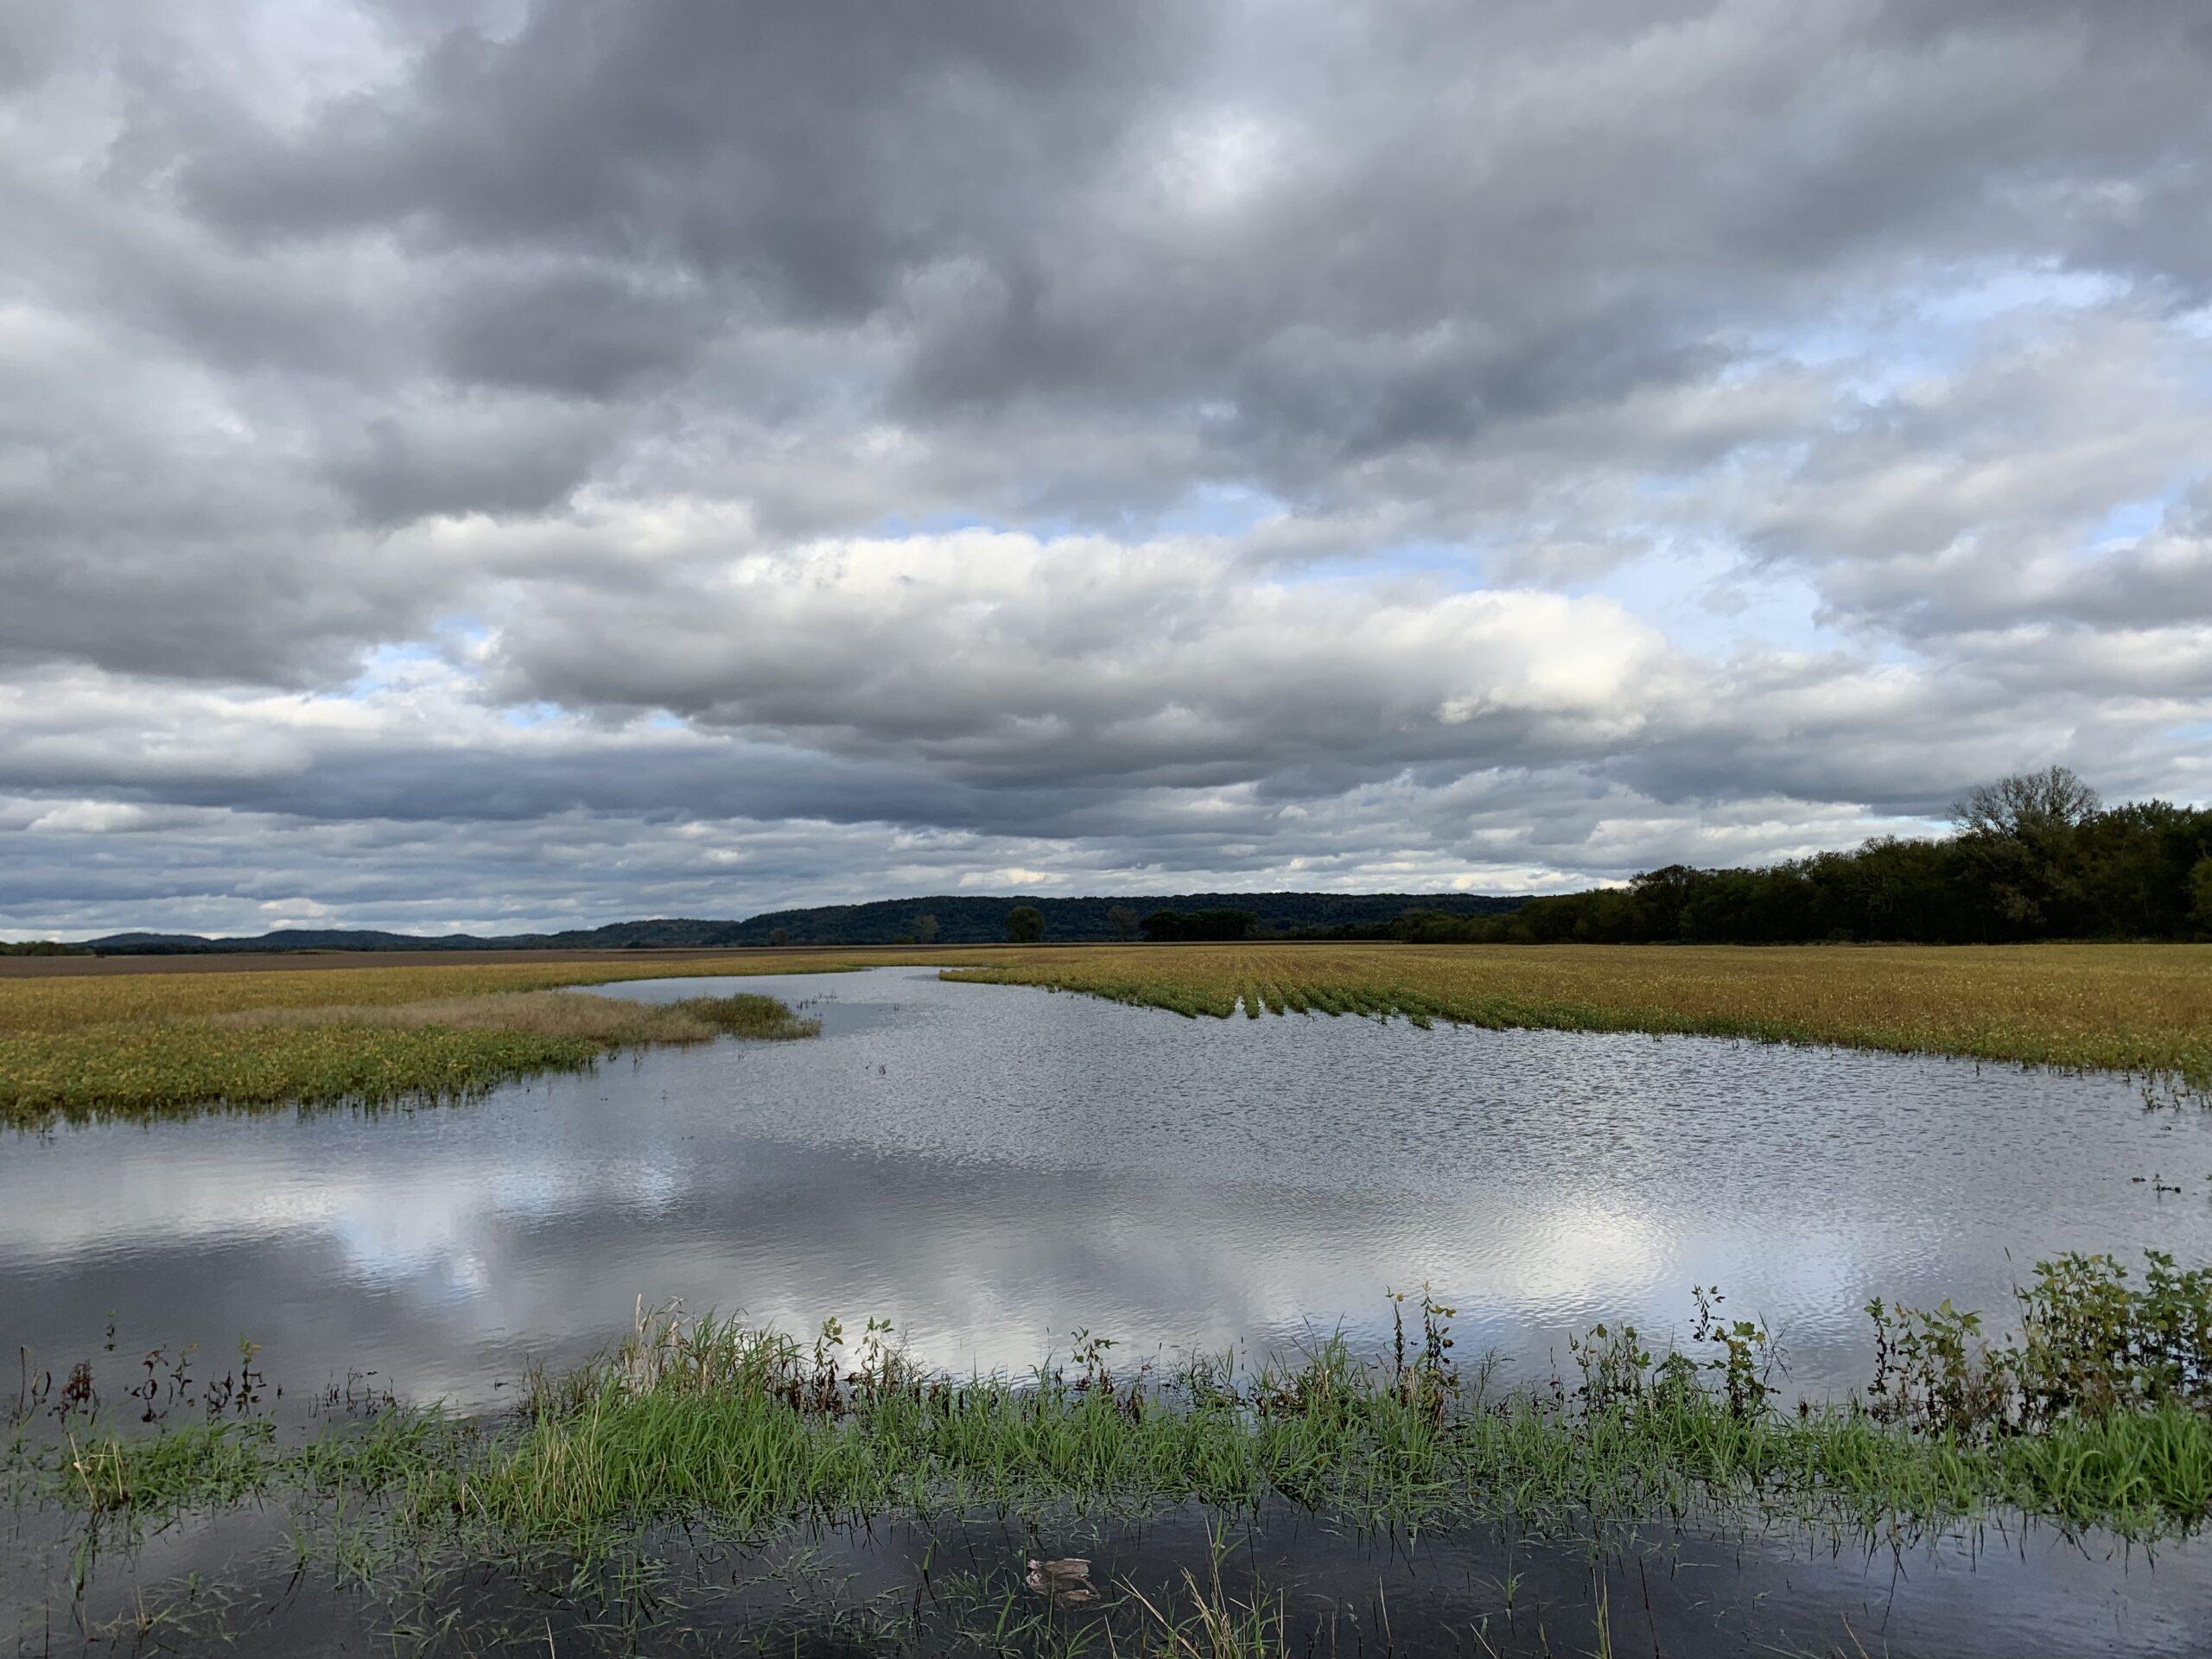 Molly Jahn, Flooded soybean fields